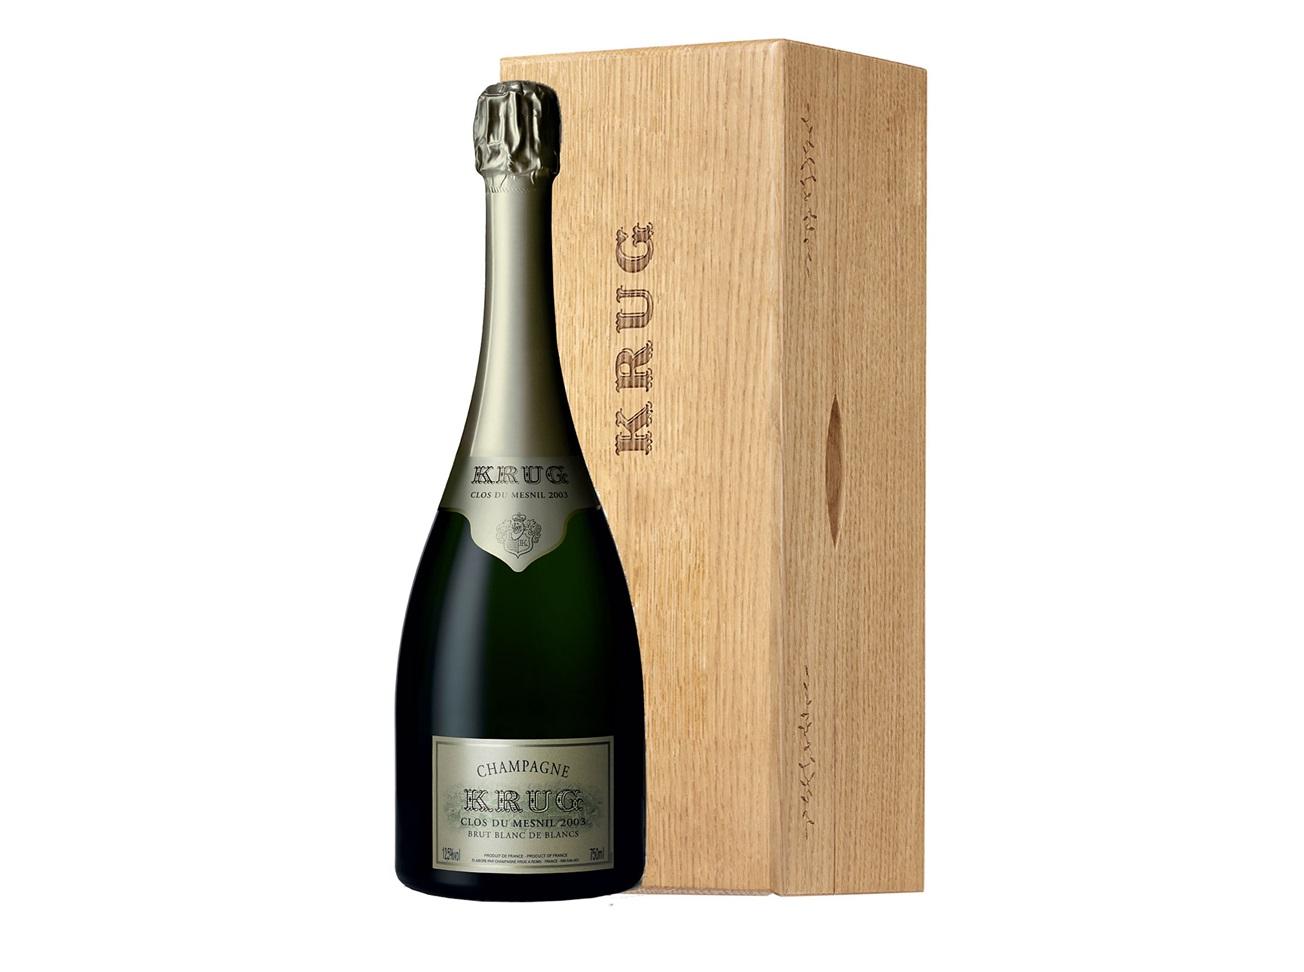 Champagne Krug Clos Du Mesnil Blanc de Blancs